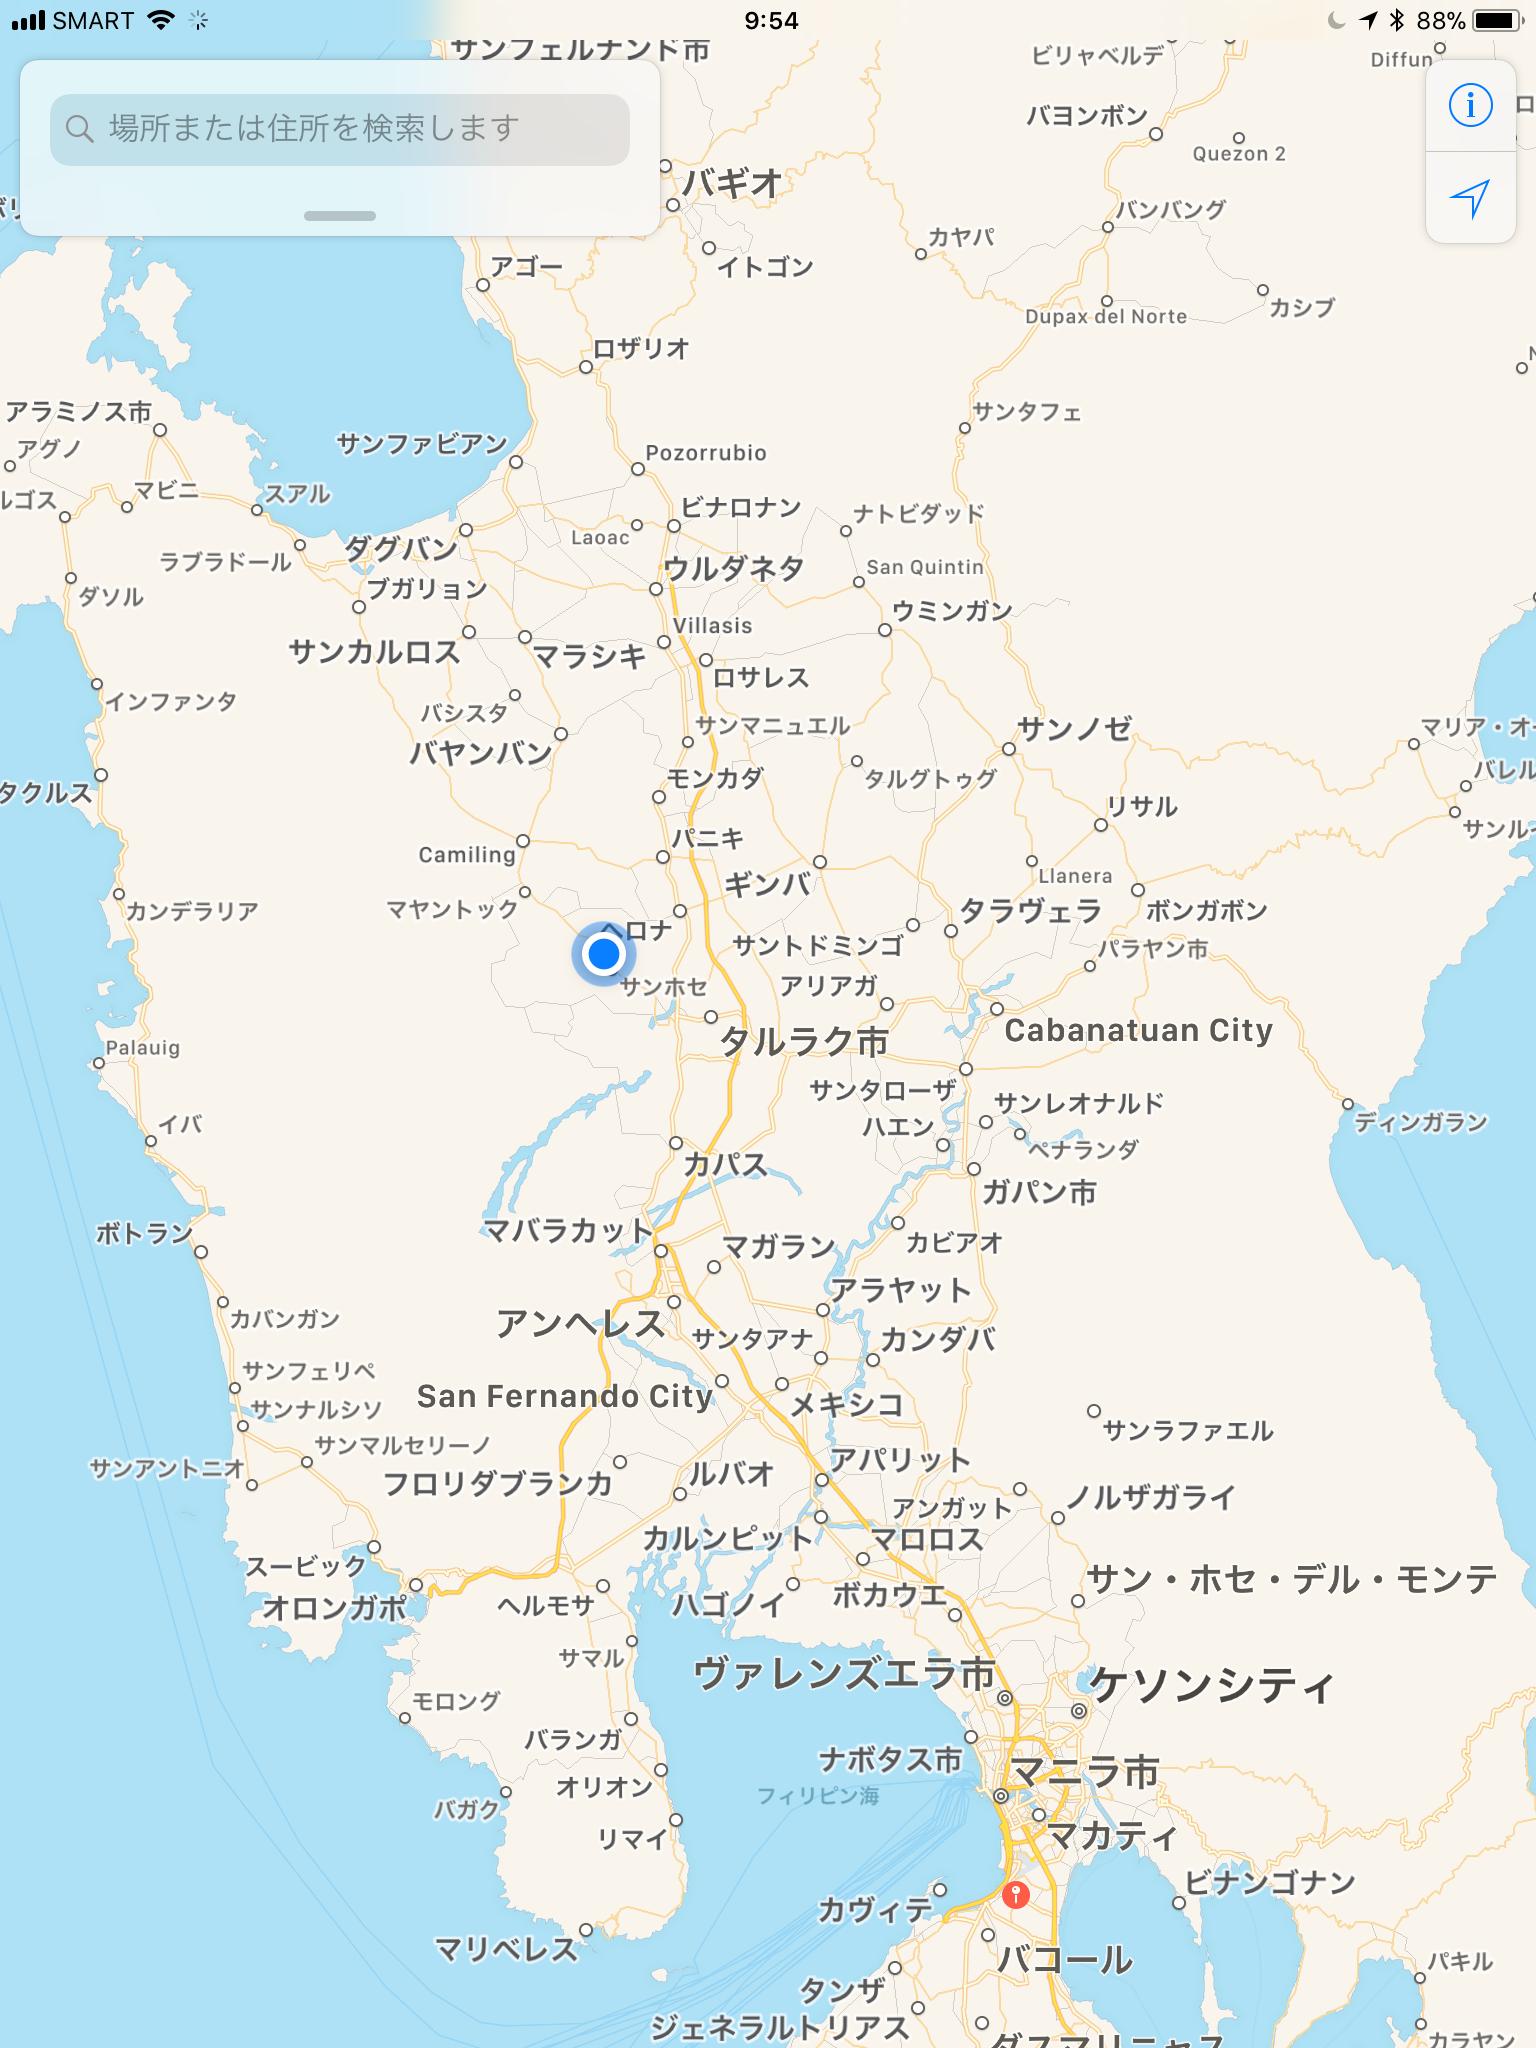 Googleマップで見る結婚式会場の位置